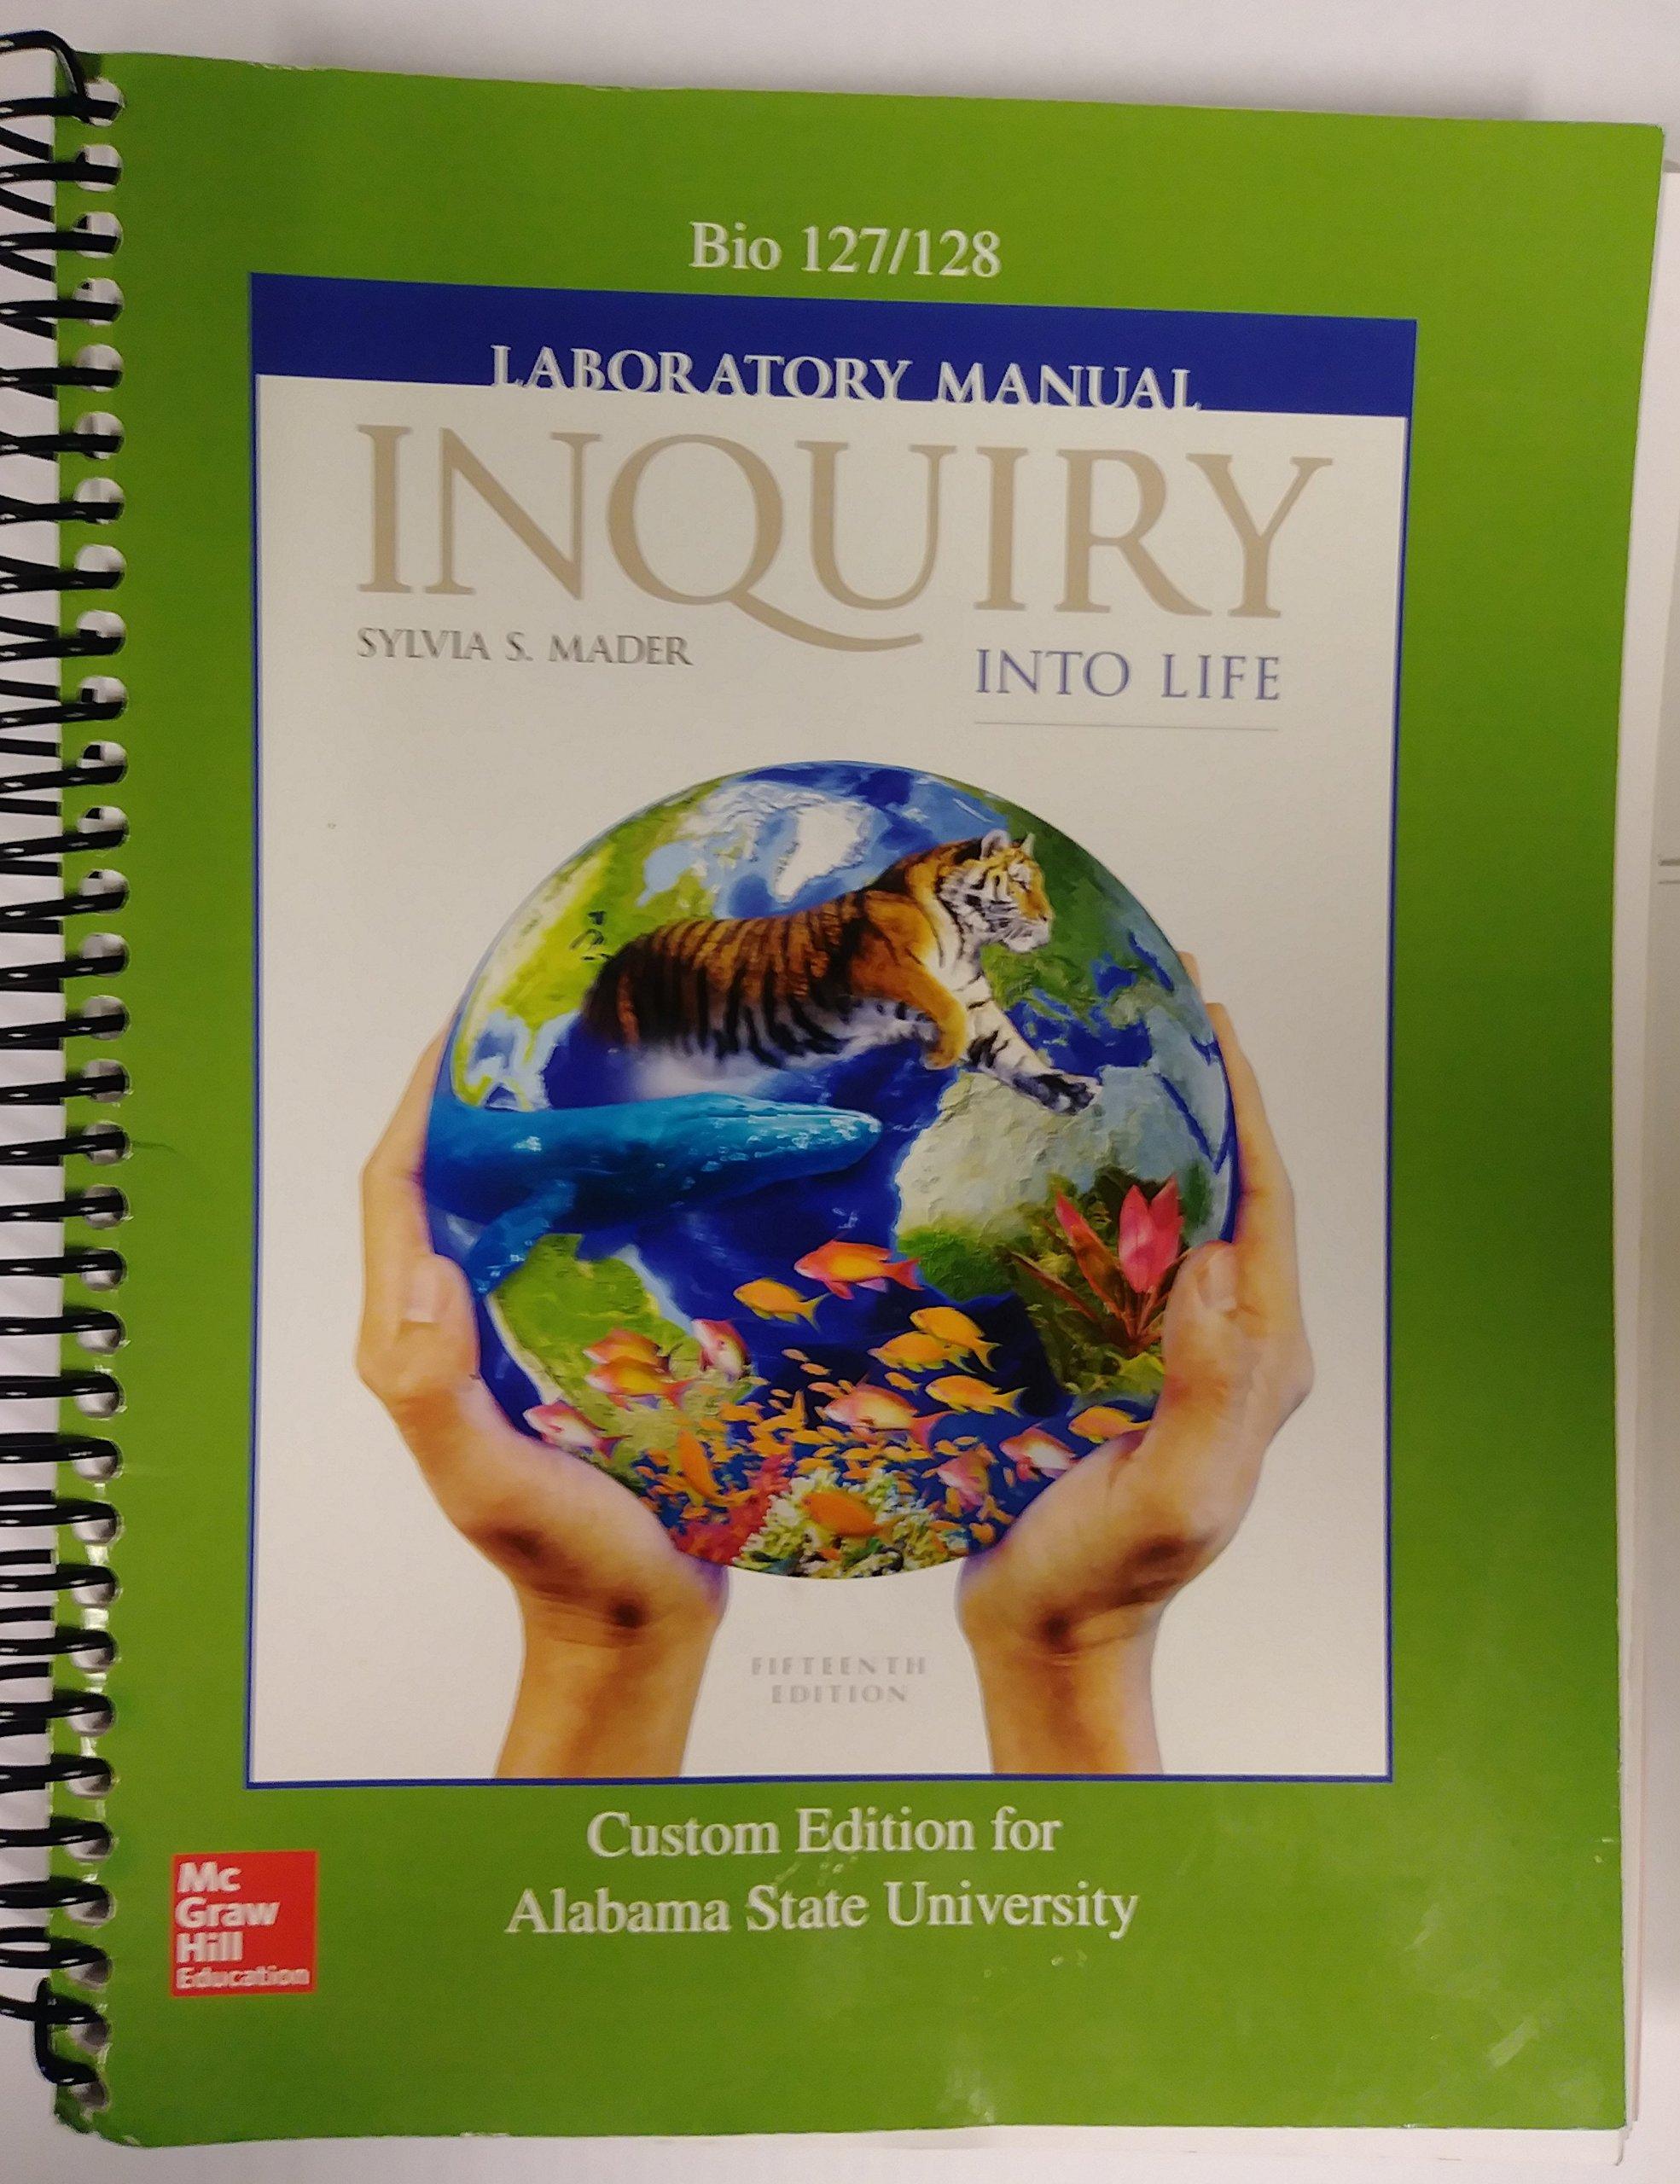 Inquiry Into Life Laboratory Manual Bio 127/128 Custom Edition for Alabama  State University: Sylvia S. Mader, Linda Smith-Staton: 9781259961786:  Amazon.com: ...